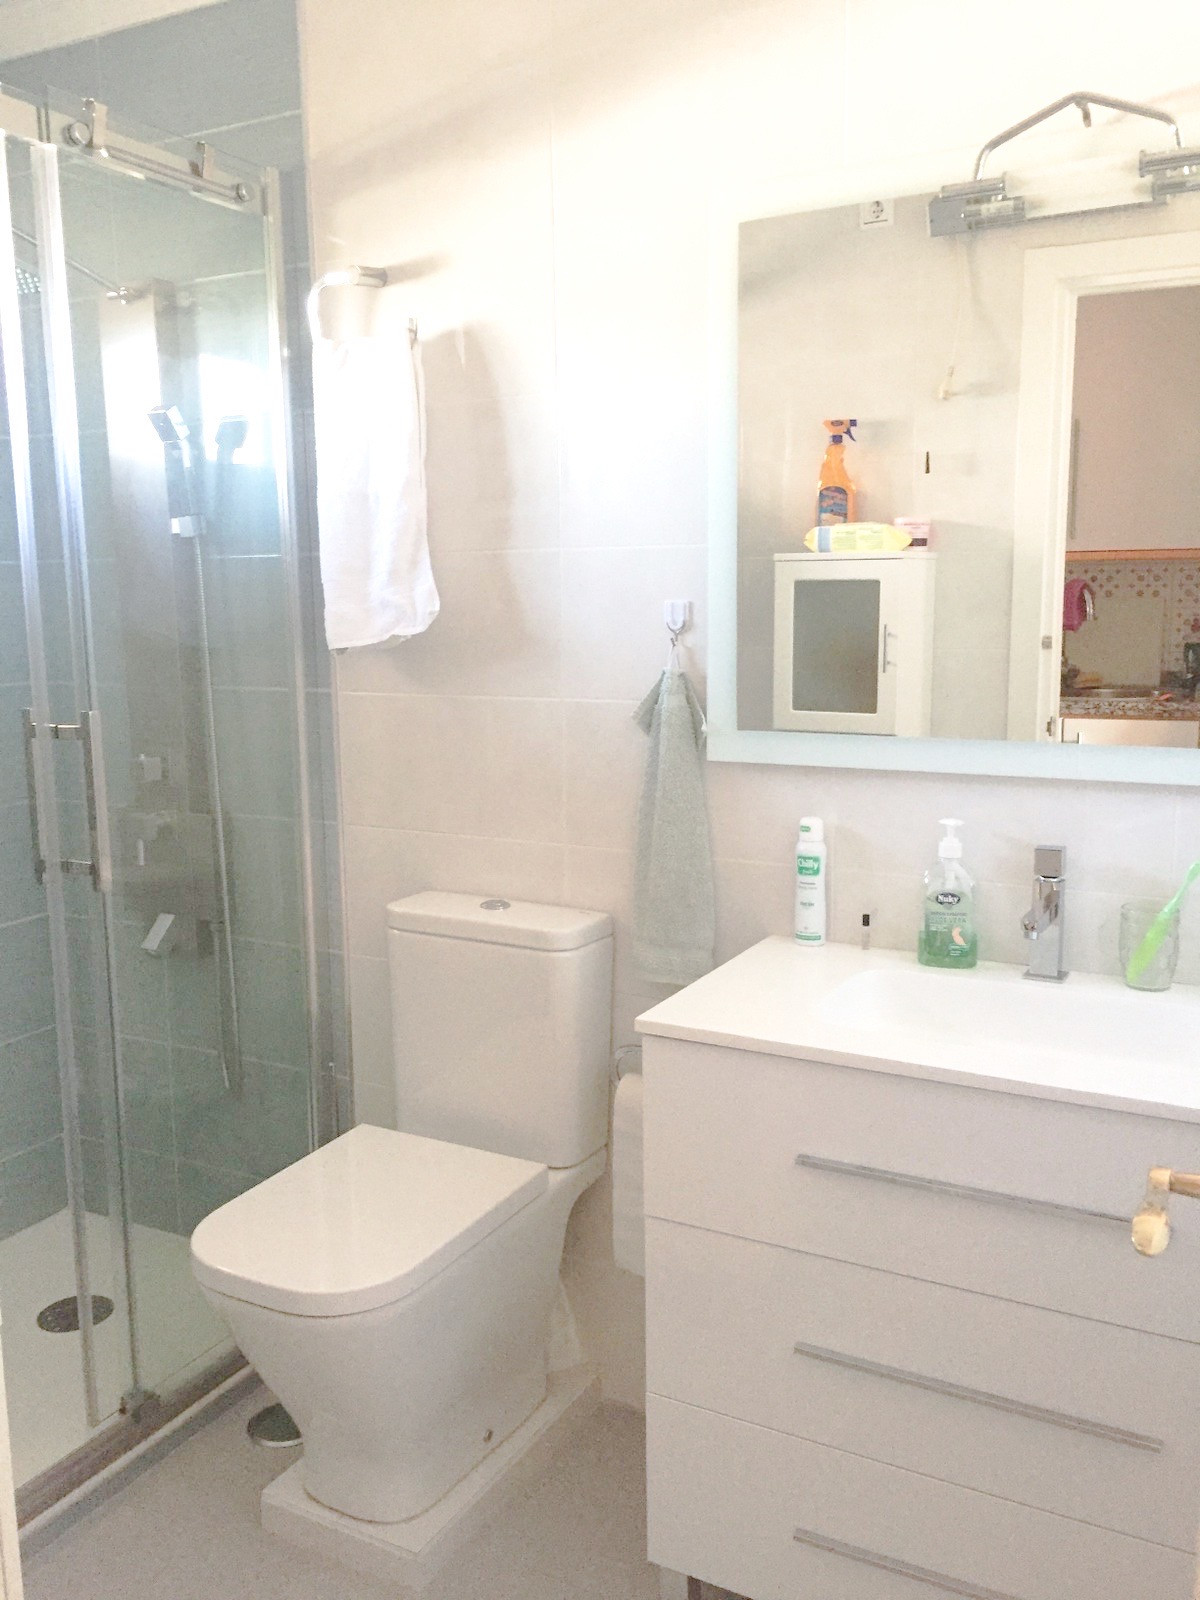 R3201517: Apartment for sale in Calypso